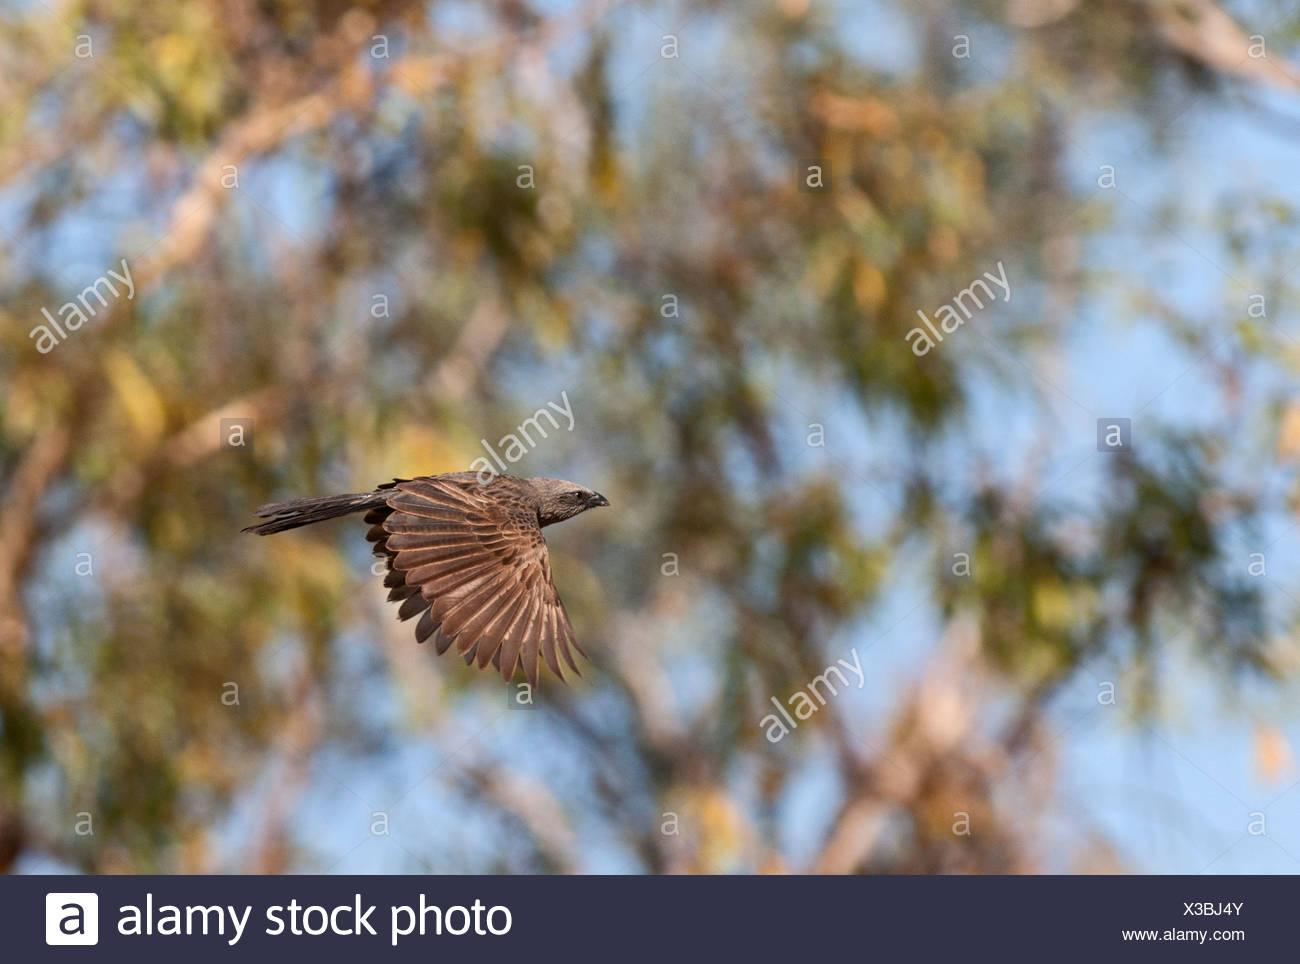 Apostlebird Struthidea cinerea Queensland Australia - Stock Image